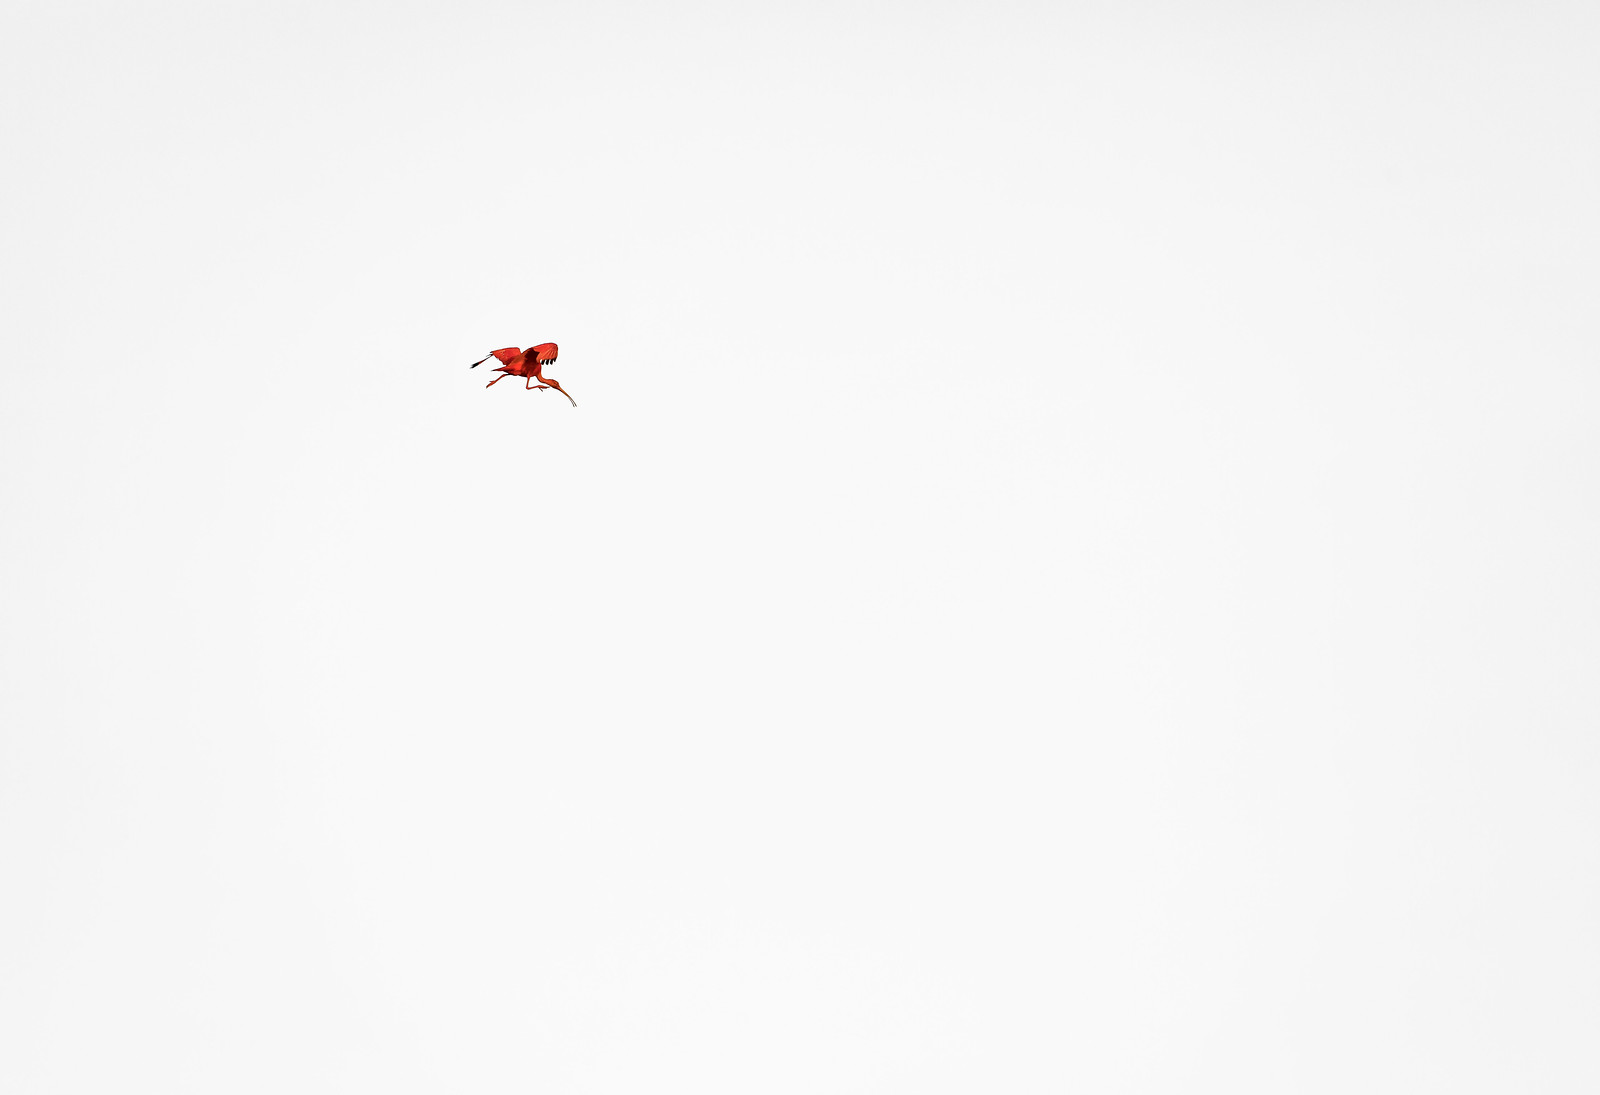 Incoming scarlet ibis